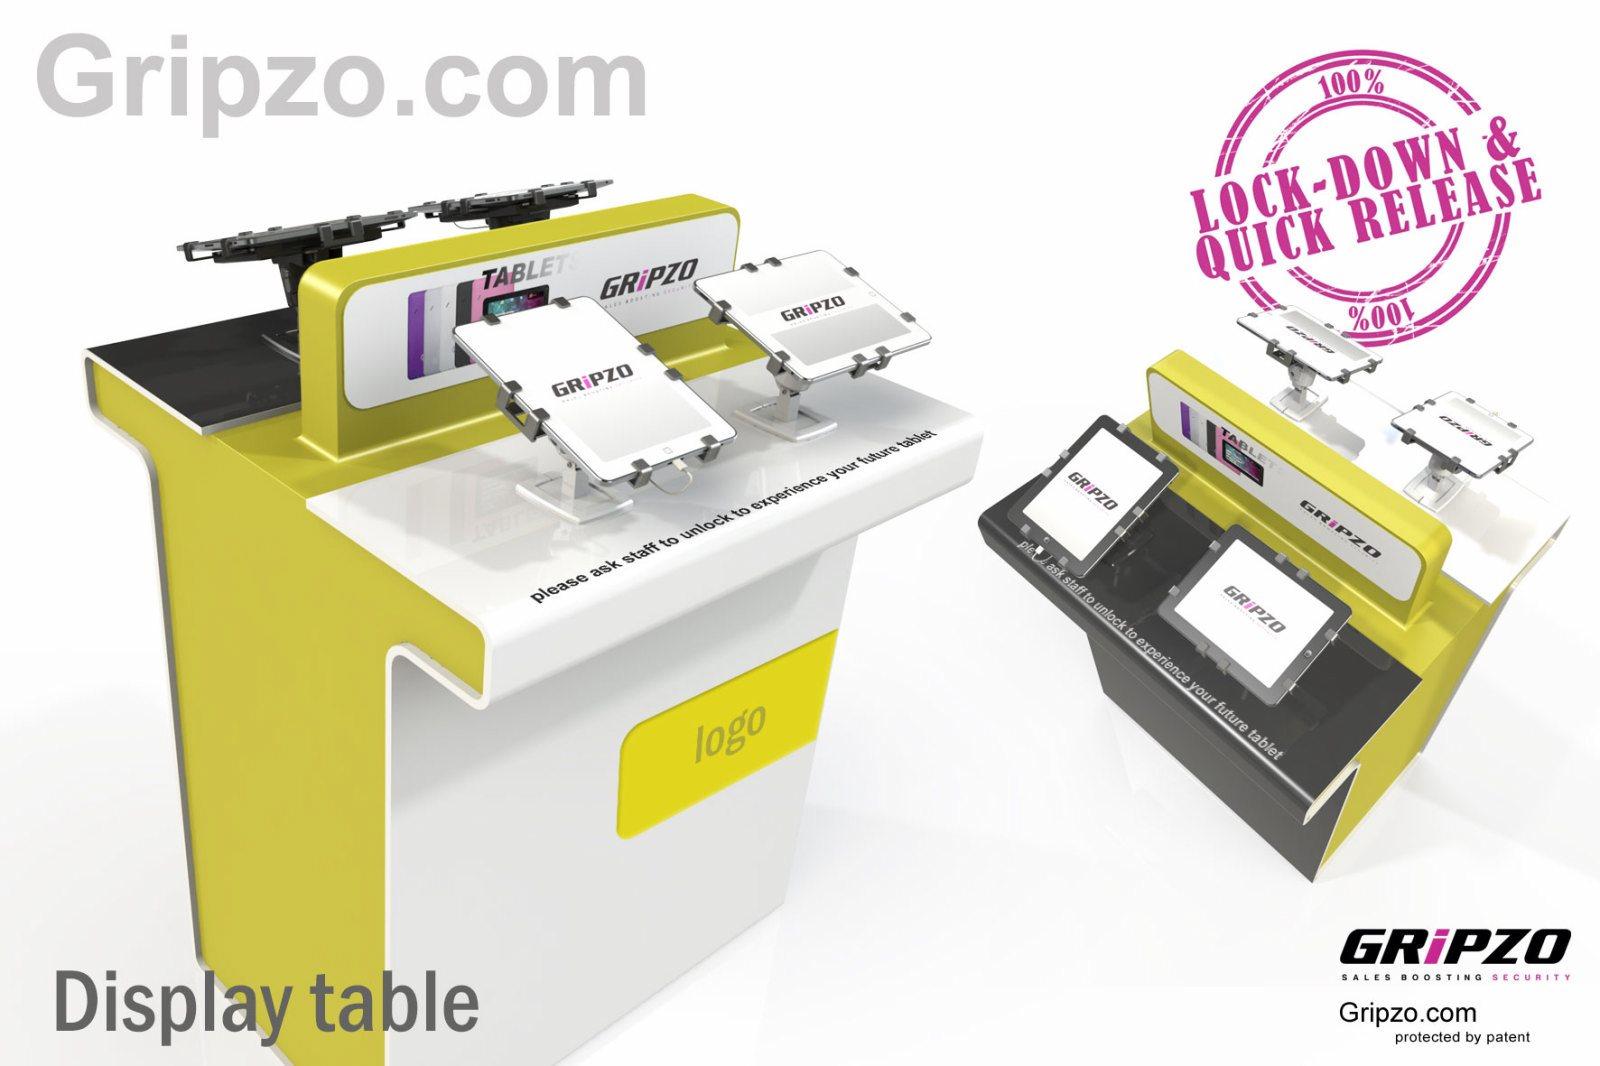 gripzo-tablet-grip-black-and-white-display.jpg